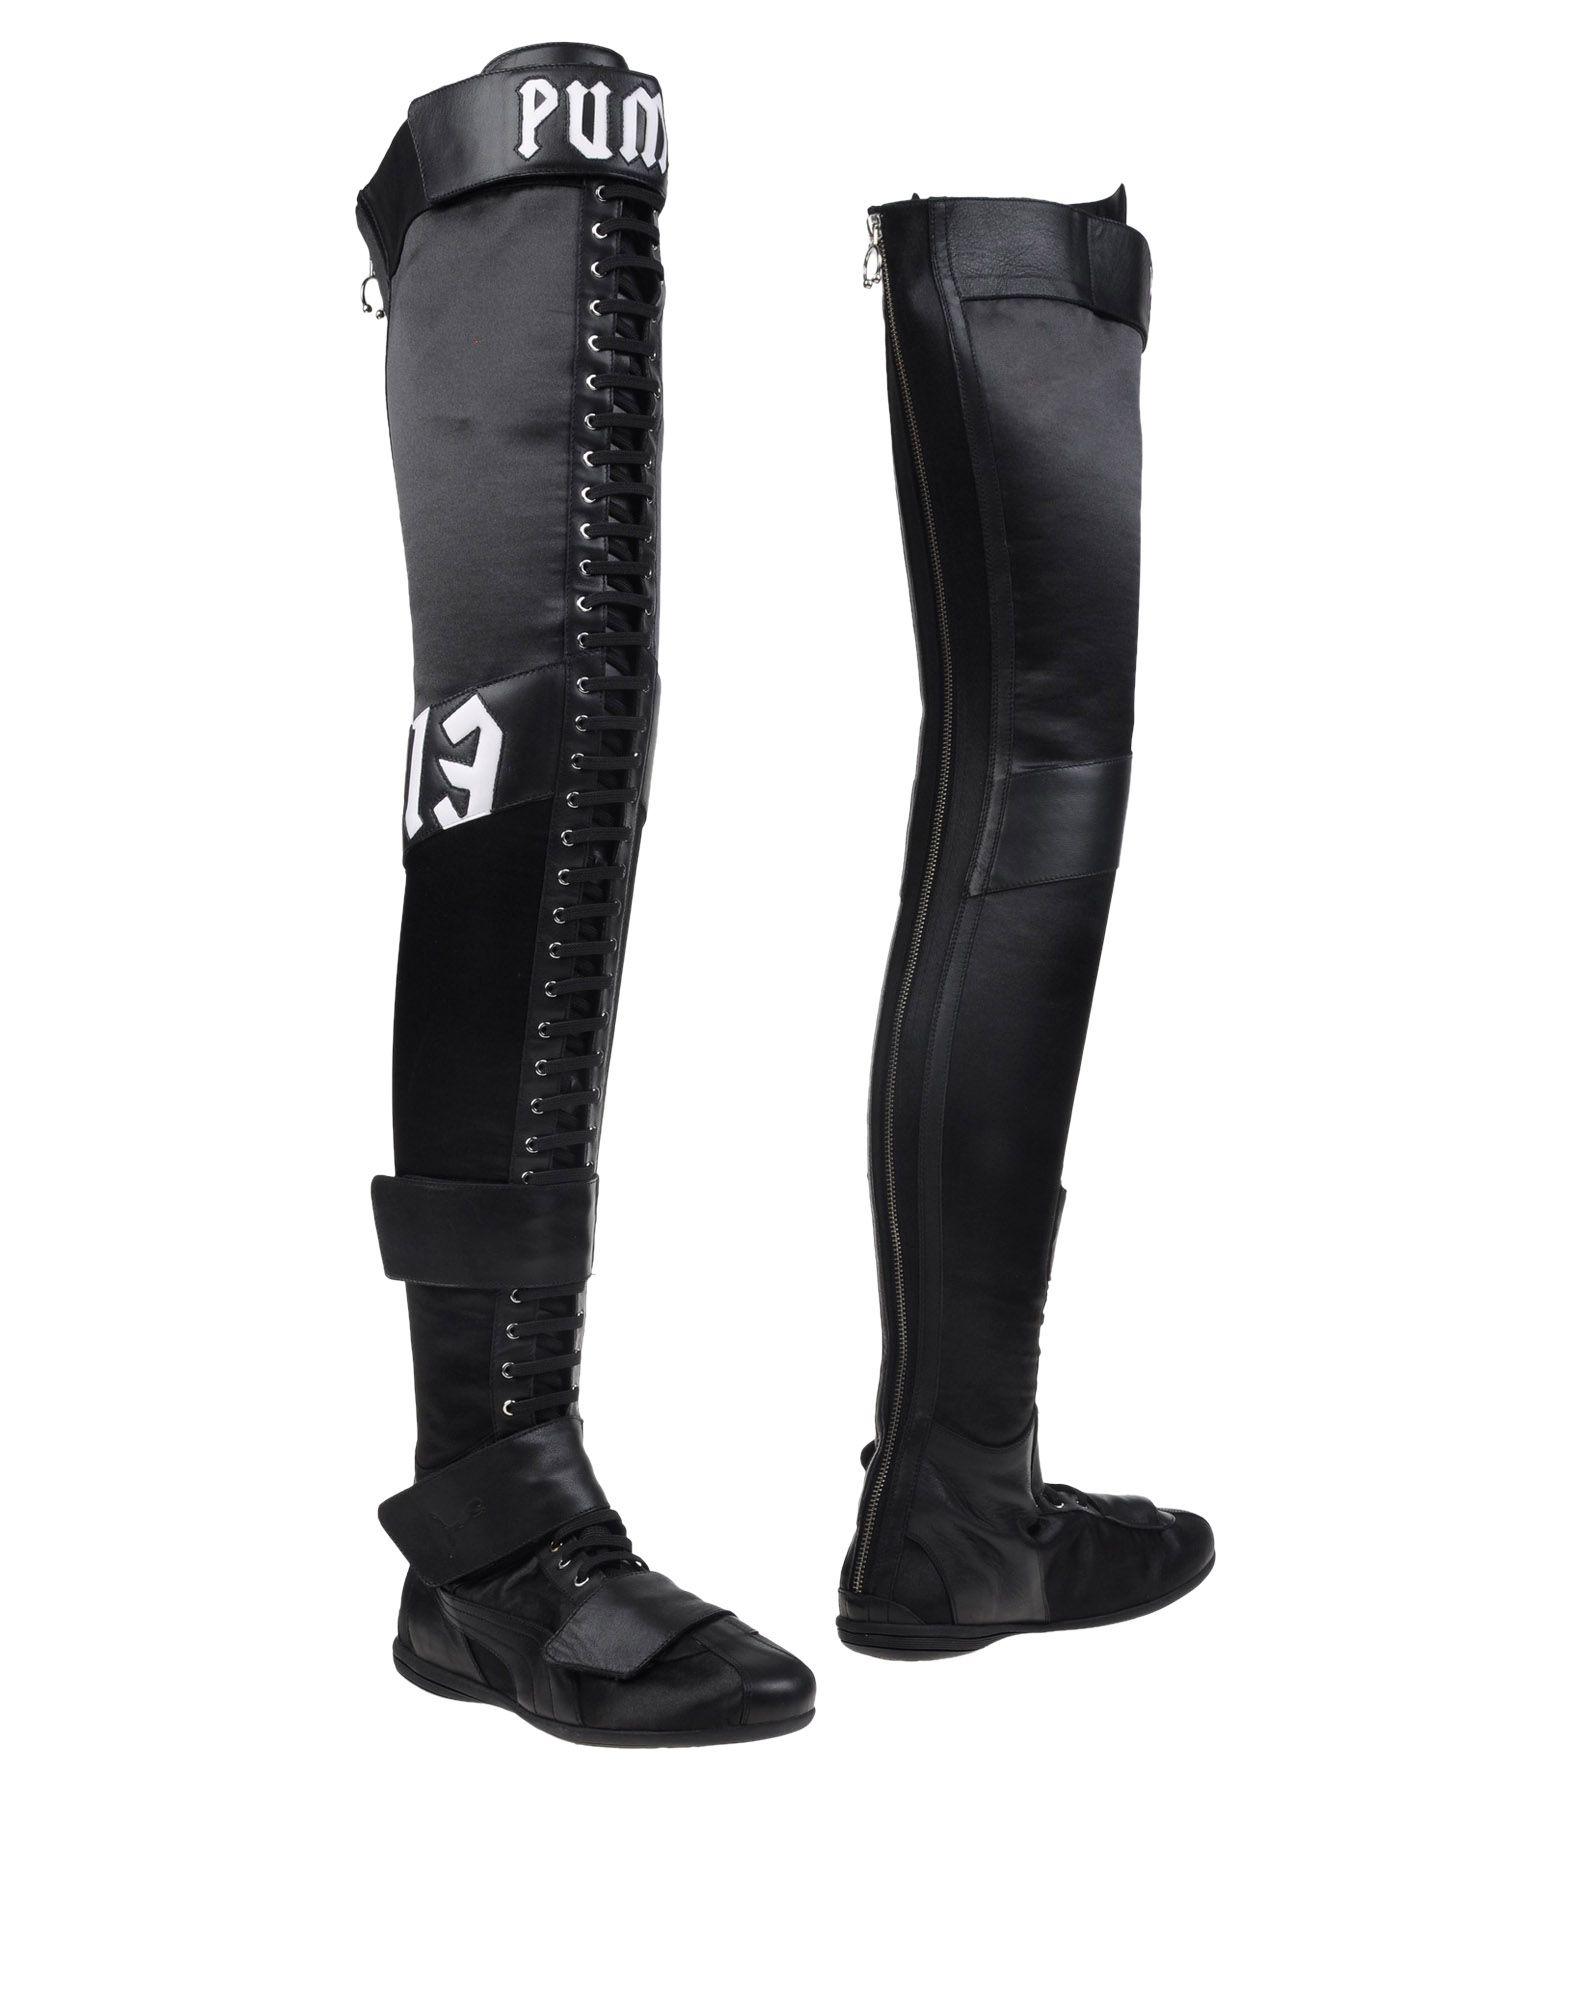 super popular 5d96d 3e3b1 FENTY PUMA by RIHANNA Boots - Footwear | YOOX.COM